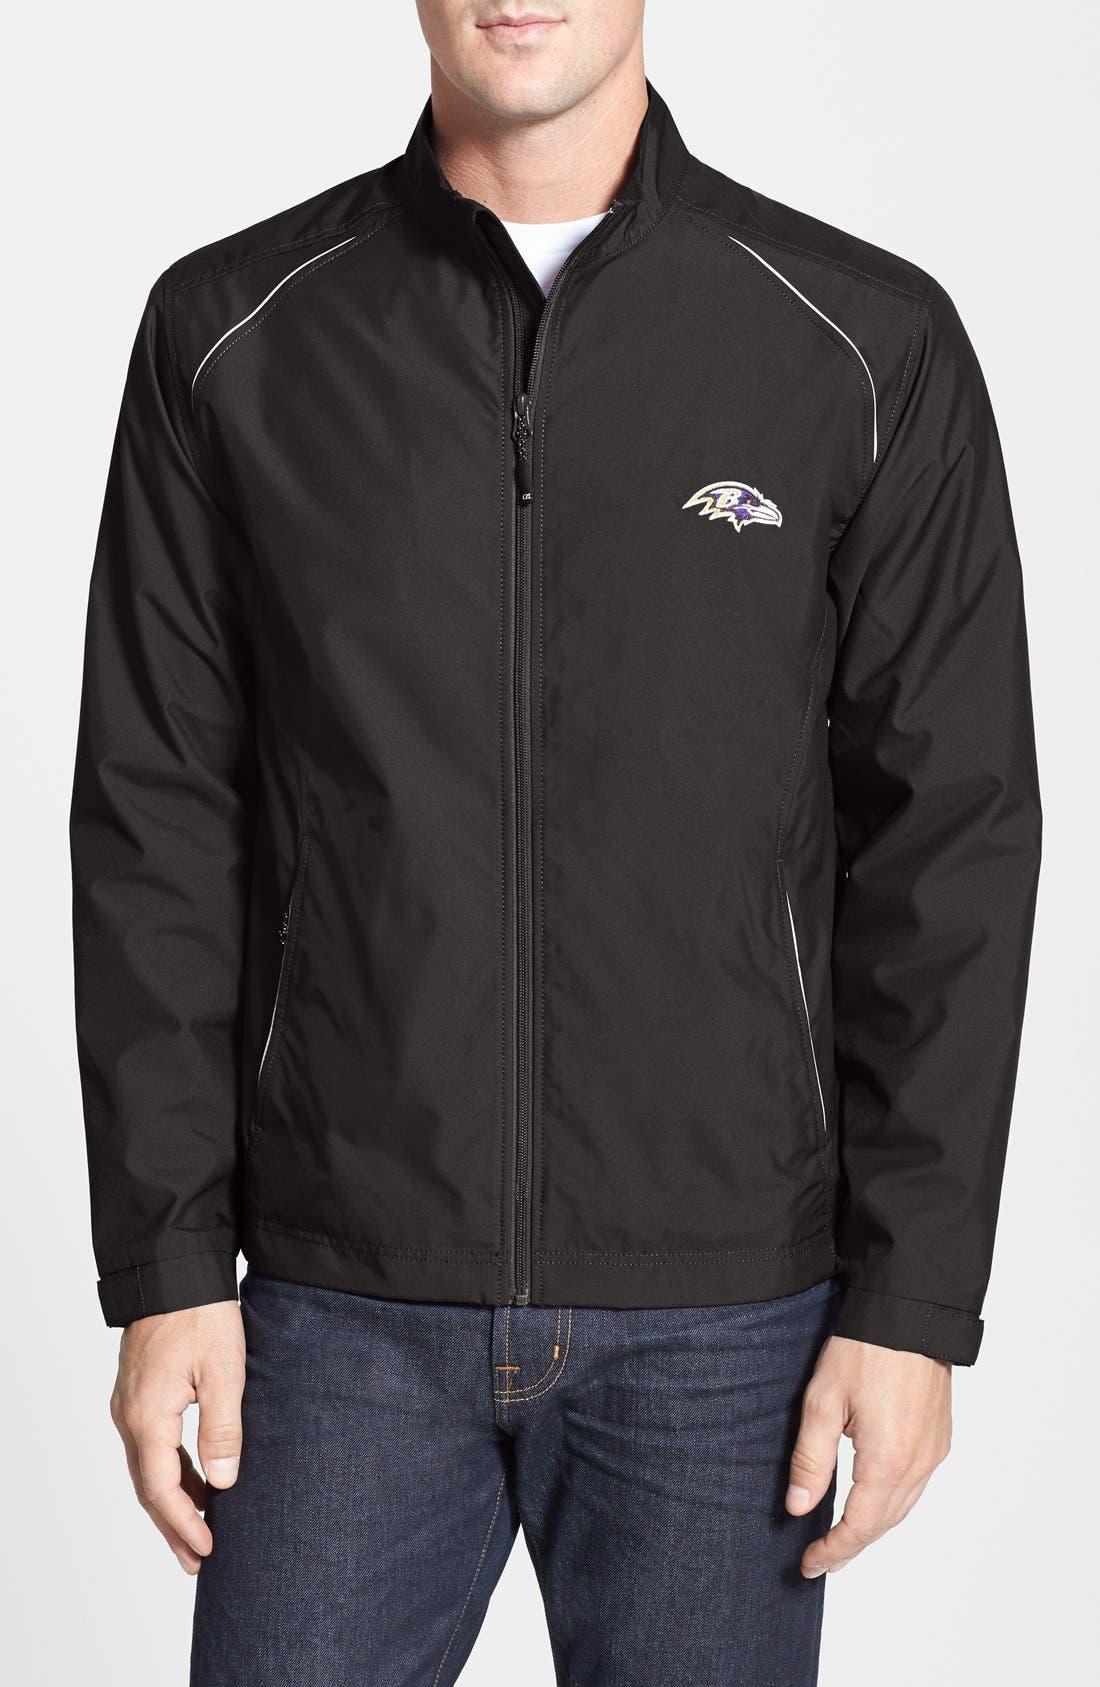 Baltimore Ravens - Beacon WeatherTec Wind & Water Resistant Jacket,                         Main,                         color, Black